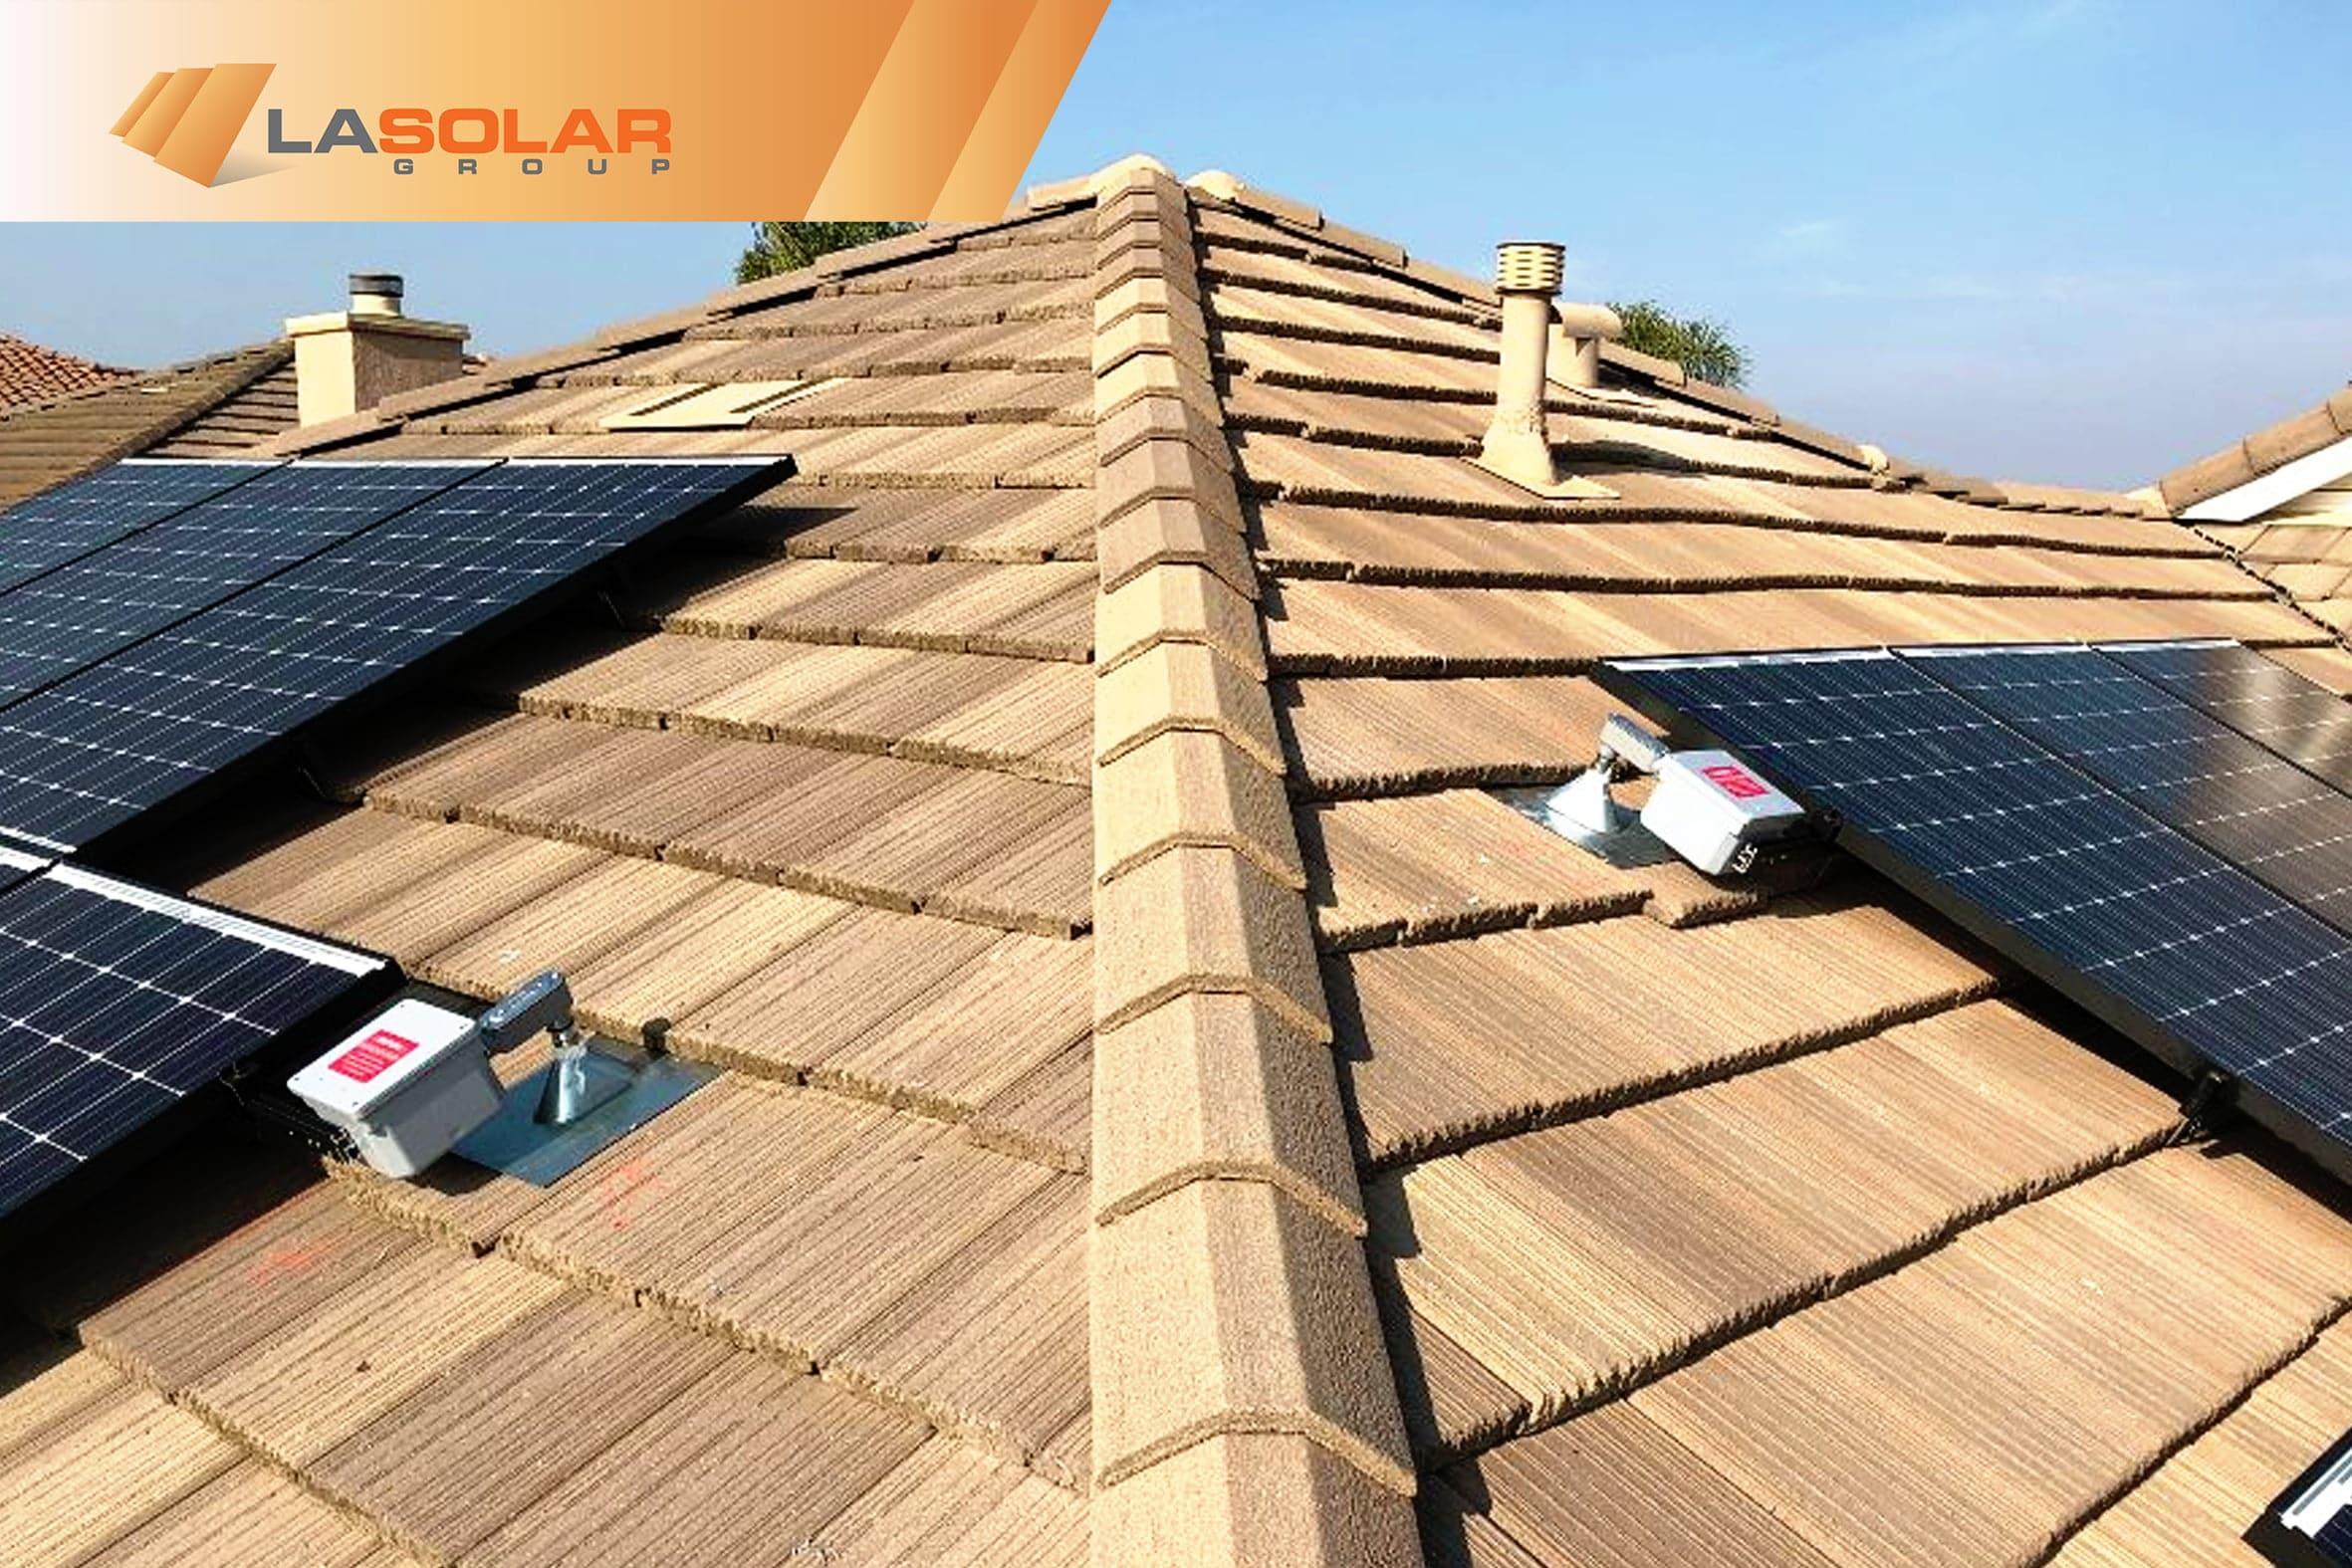 roof tiles solar panel installation